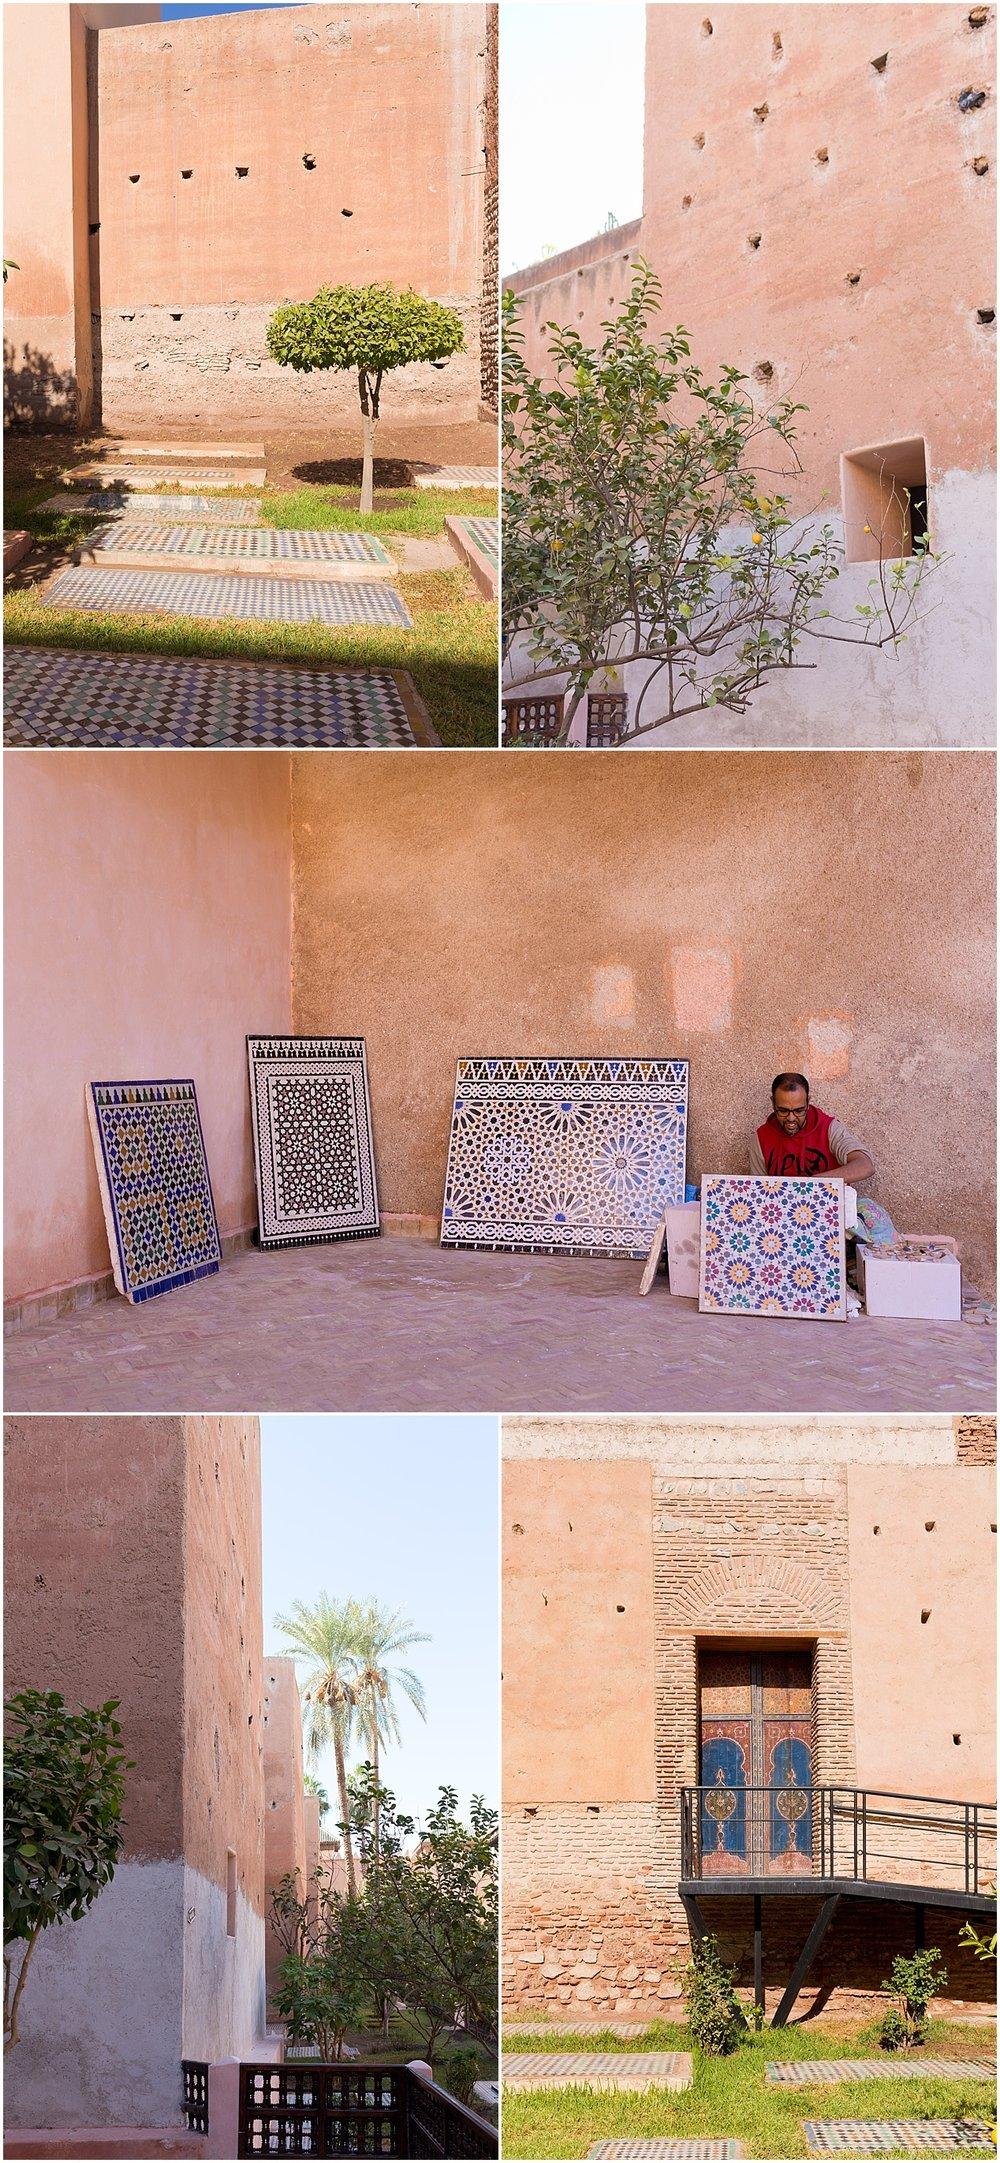 architecture at Marrakesh Saadian tombs